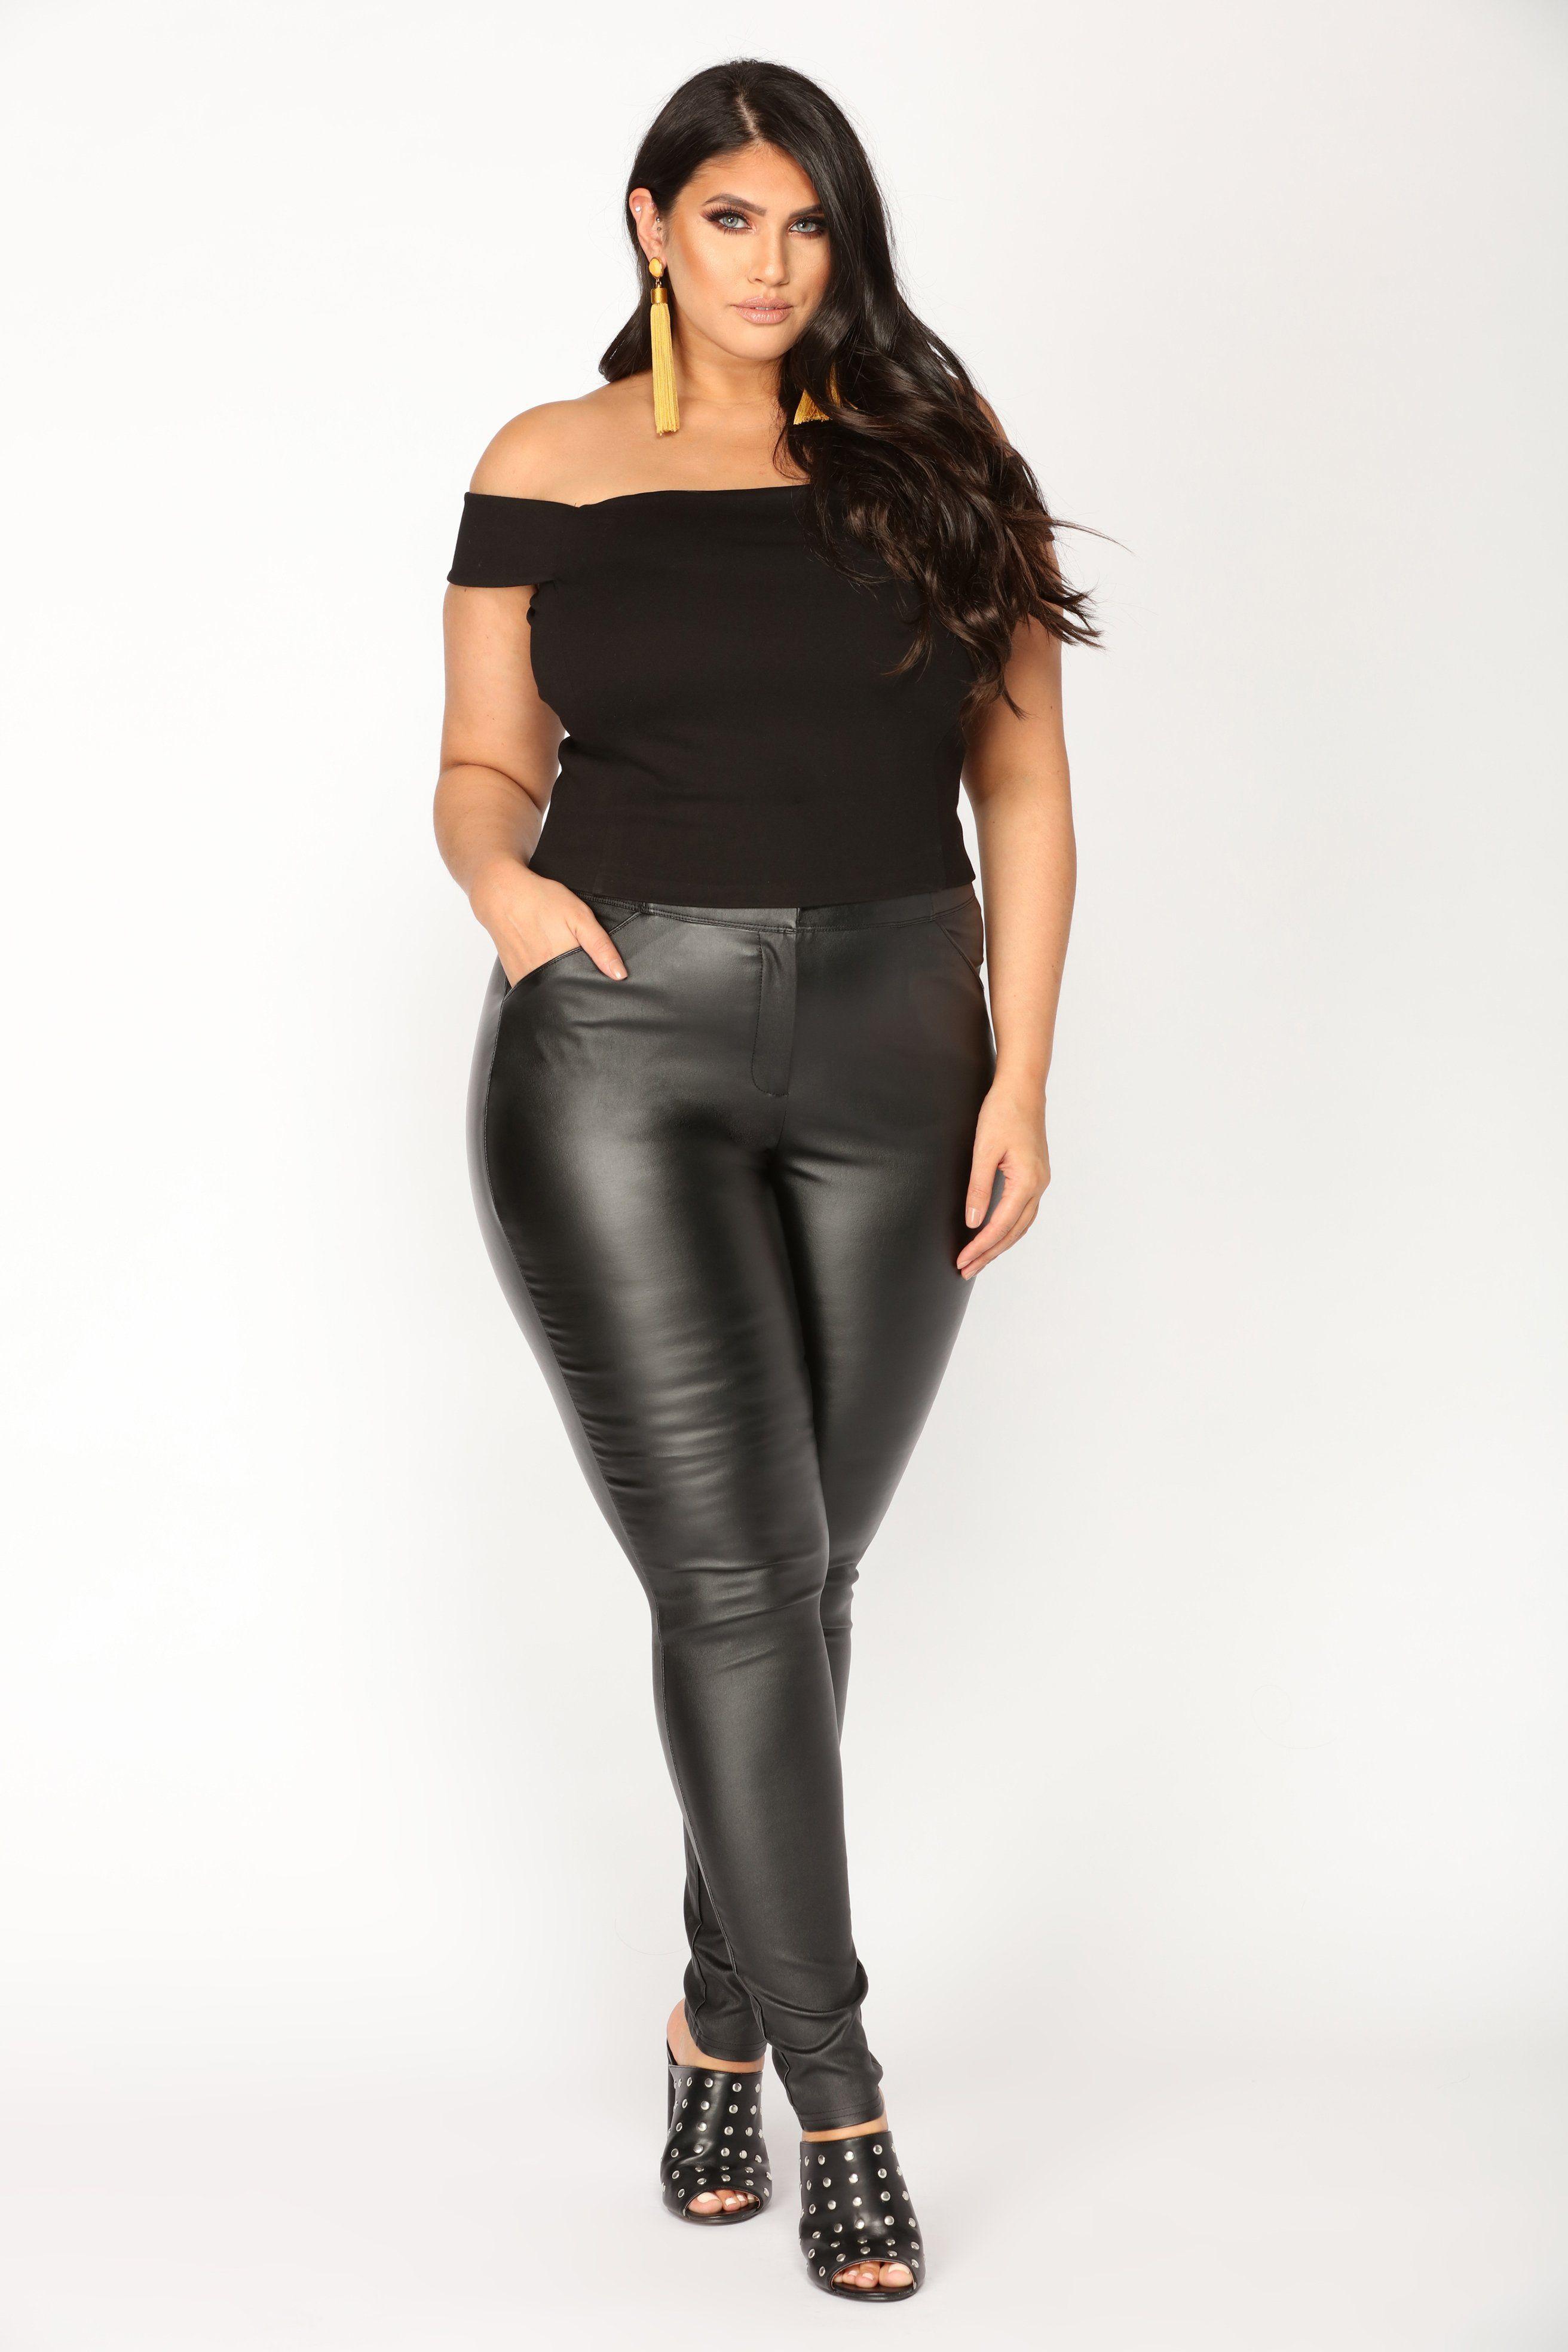 Curvy Women Fashion, Big Girl Fashion, Plus Size Fashion, Womens Fashion,  Black